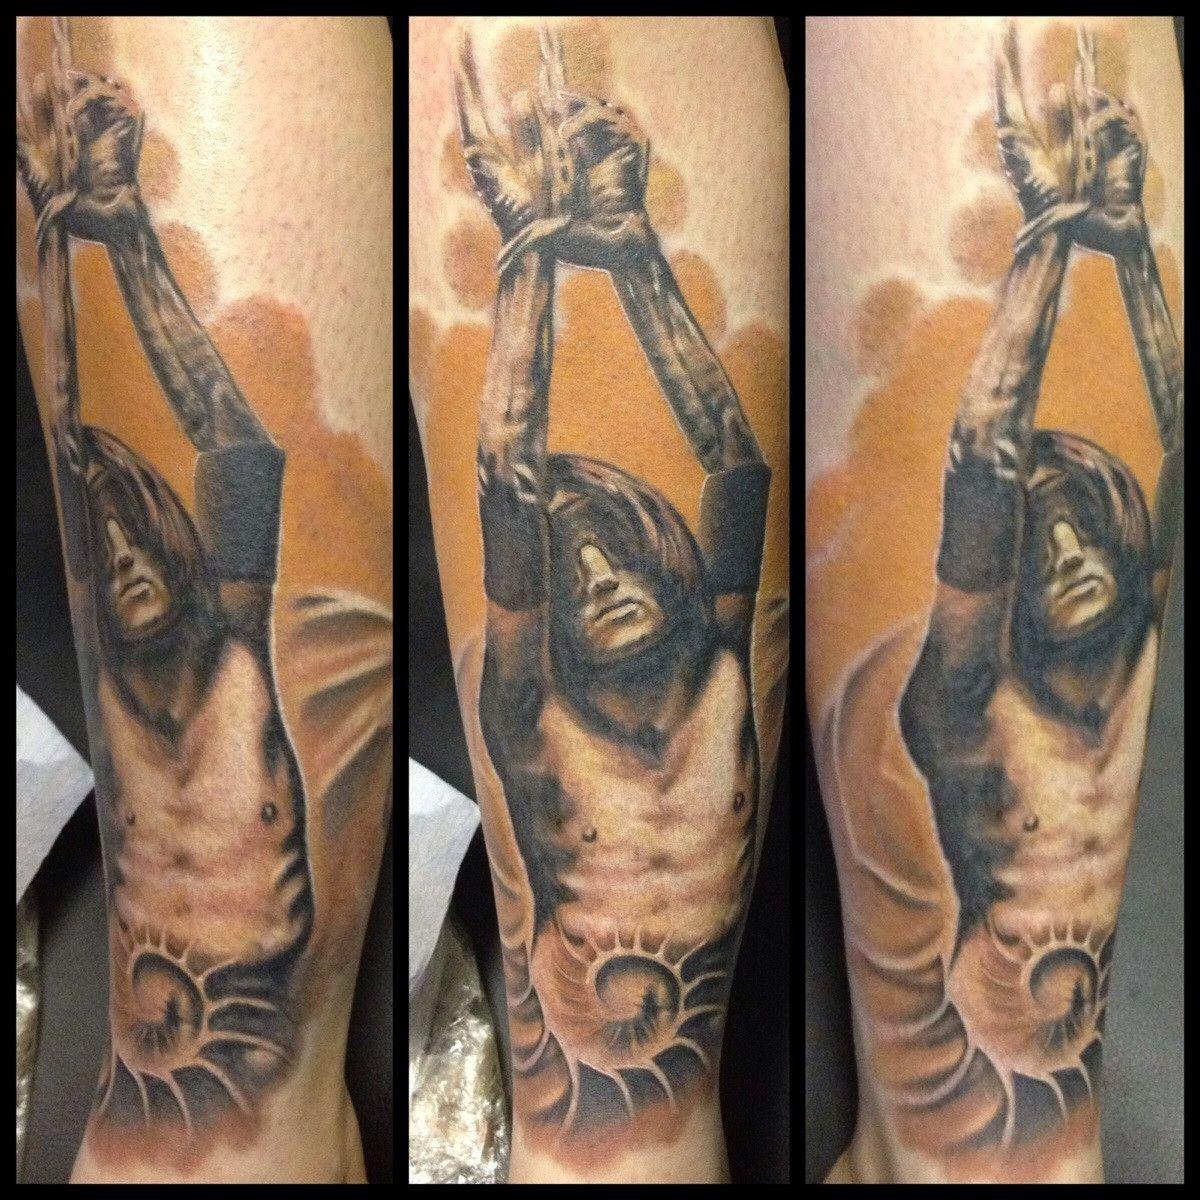 Nine Inch Nails Trent Reznor Closer music video still tattoo. | Yes ...